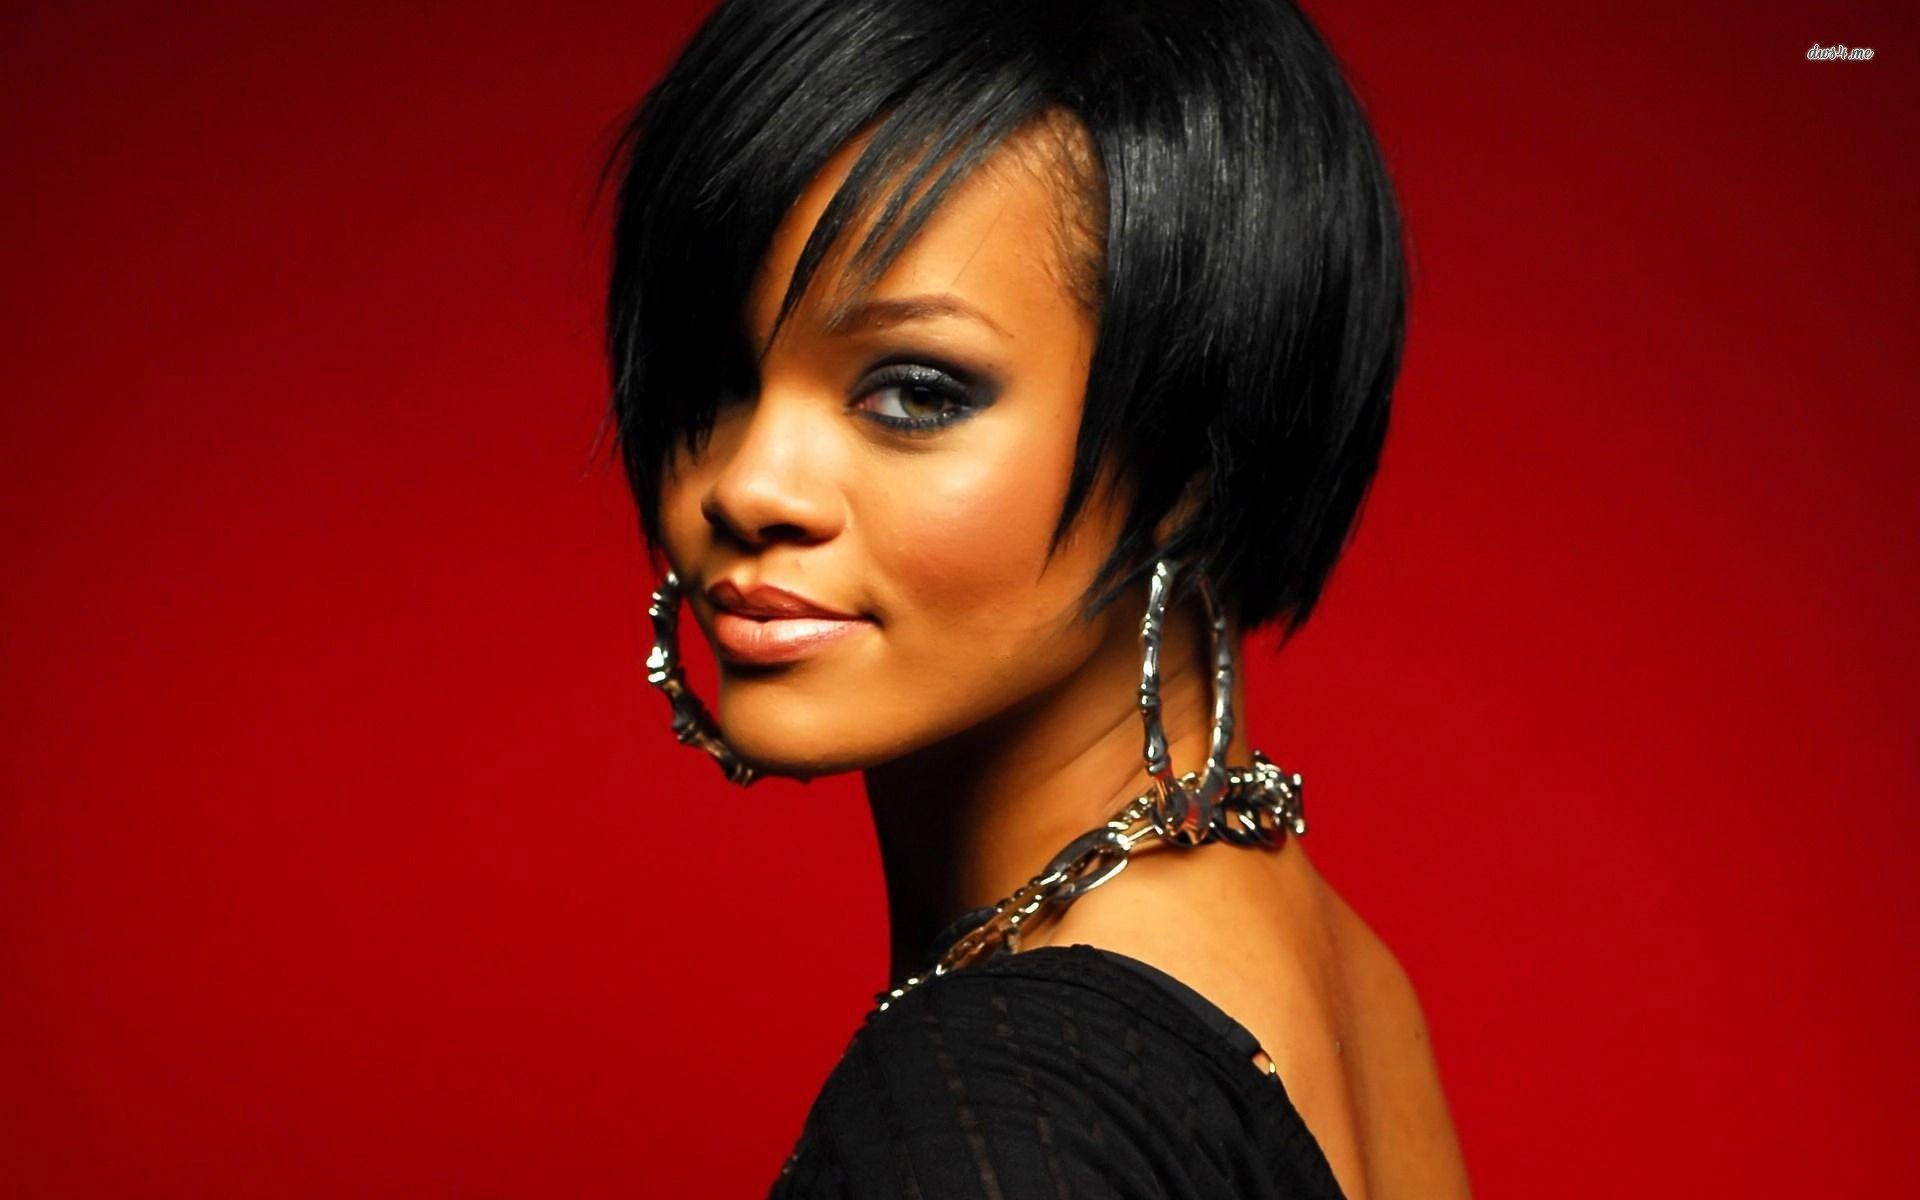 free computer wallpaper for rihanna Rihanna hairstyles